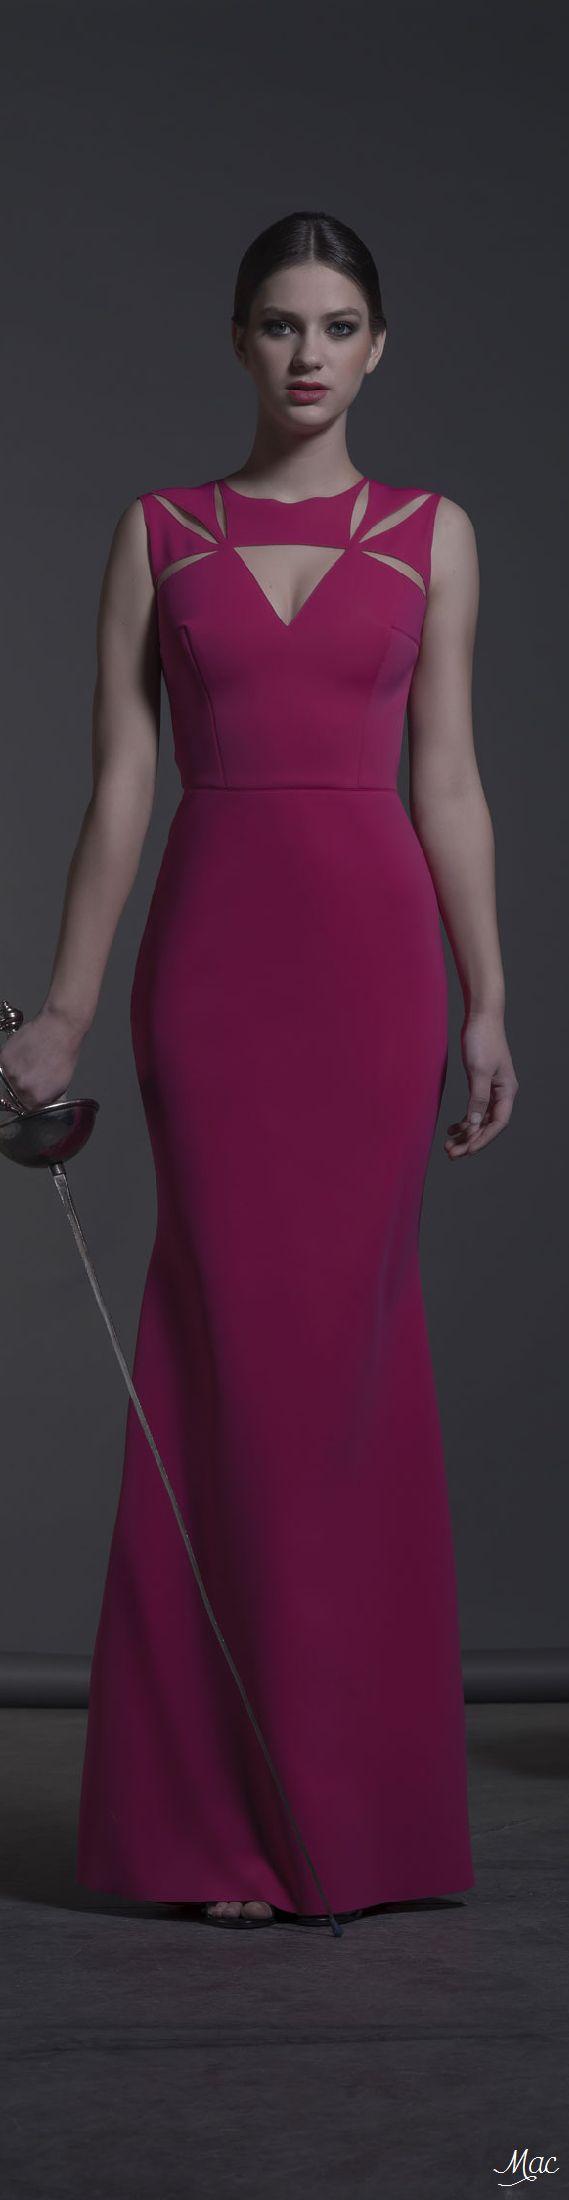 15 best Isabel sanchis images on Pinterest | Gown dress, Fashion ...